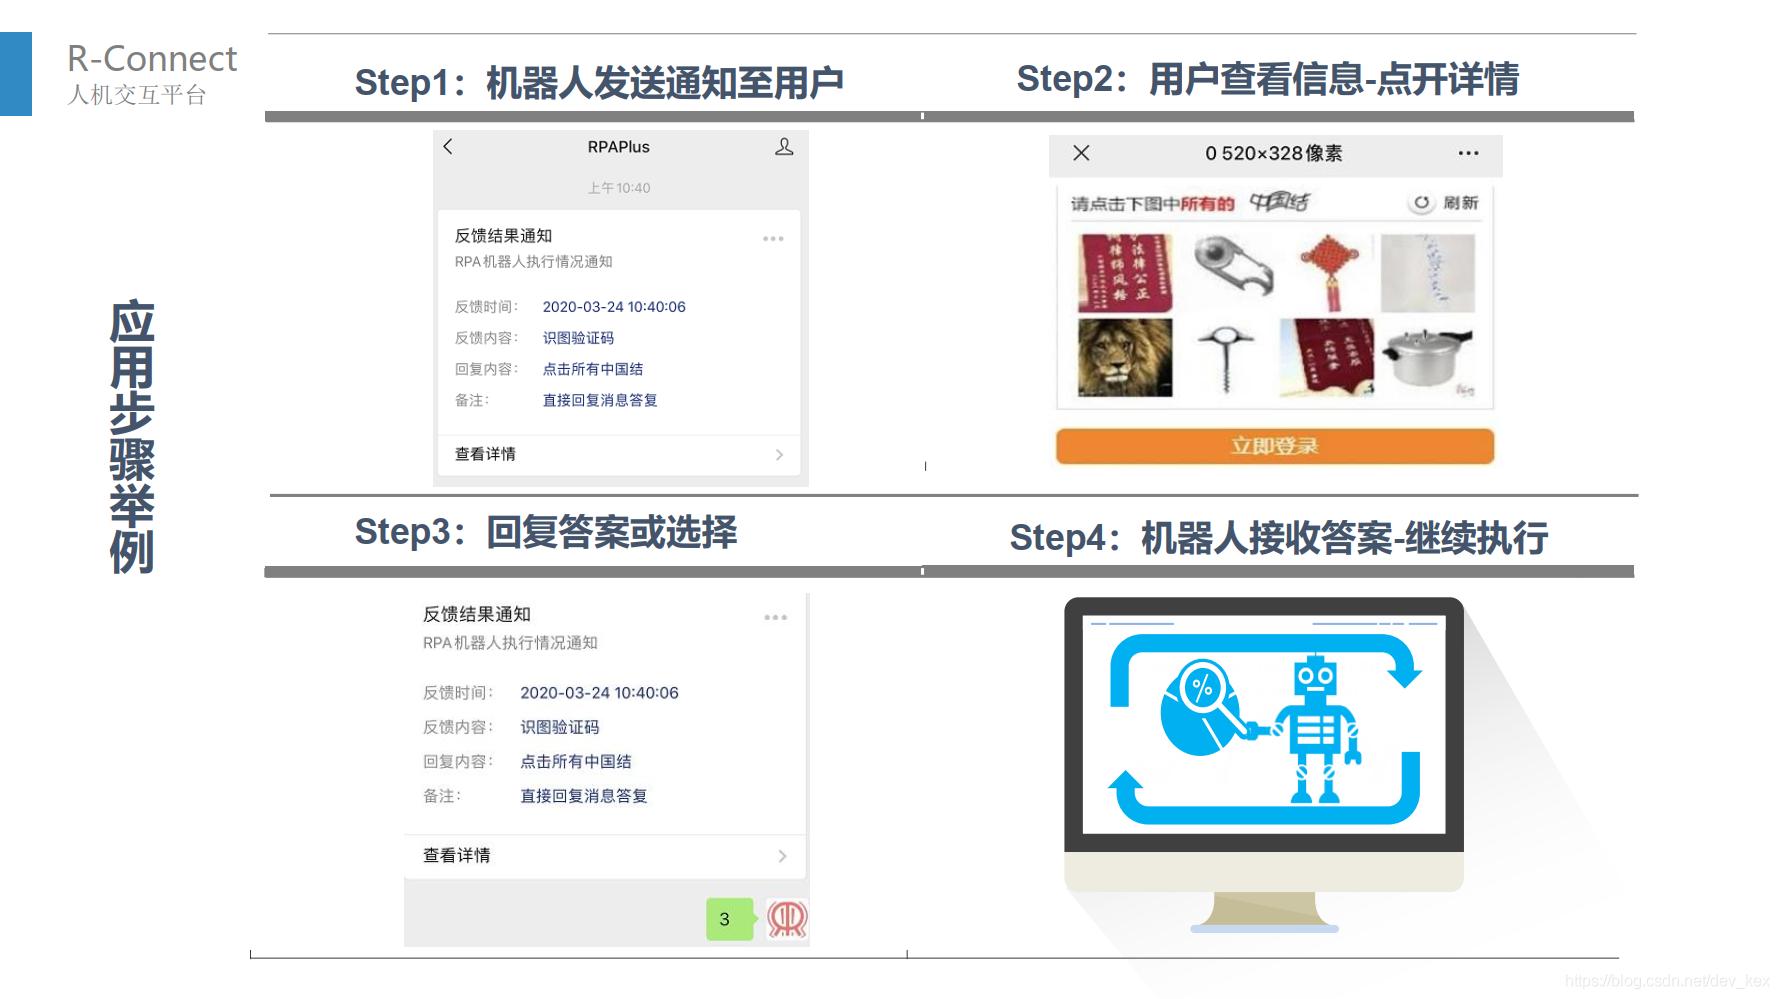 RPA开发利器,R-Connect 人机交互解决方案插图(3)